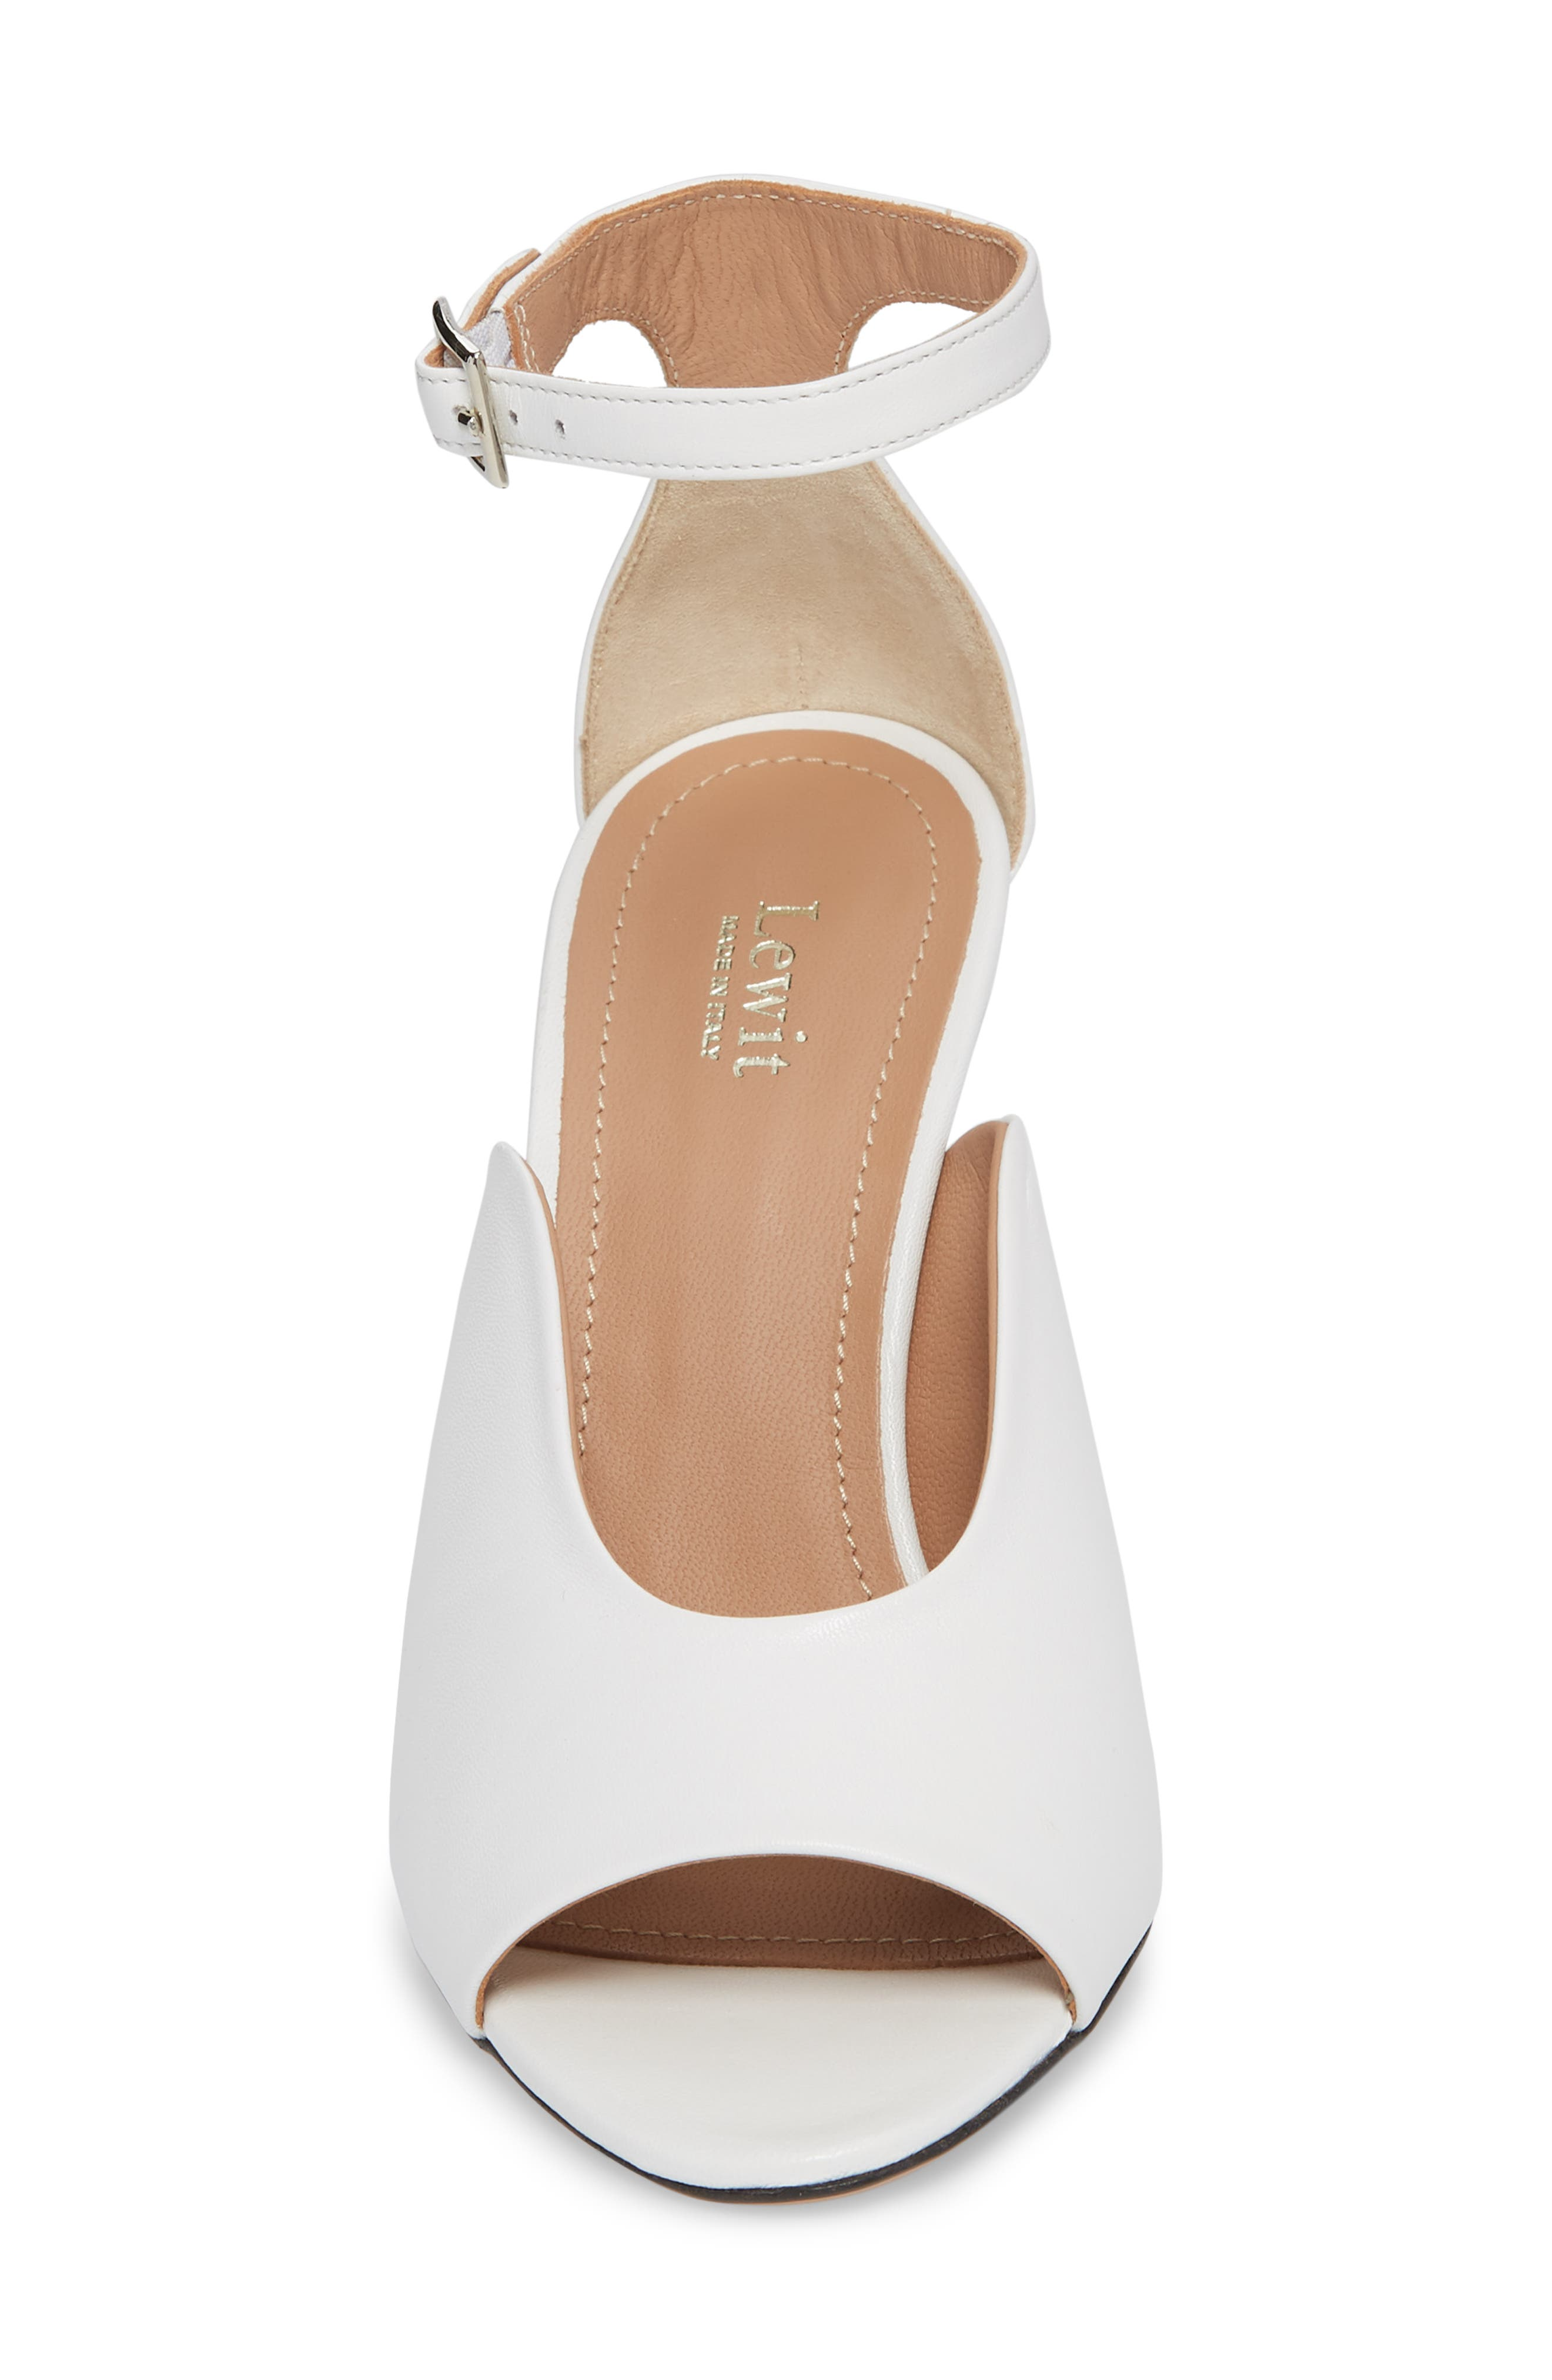 Rosalia Halo Strap Sandal,                             Alternate thumbnail 4, color,                             White Leather